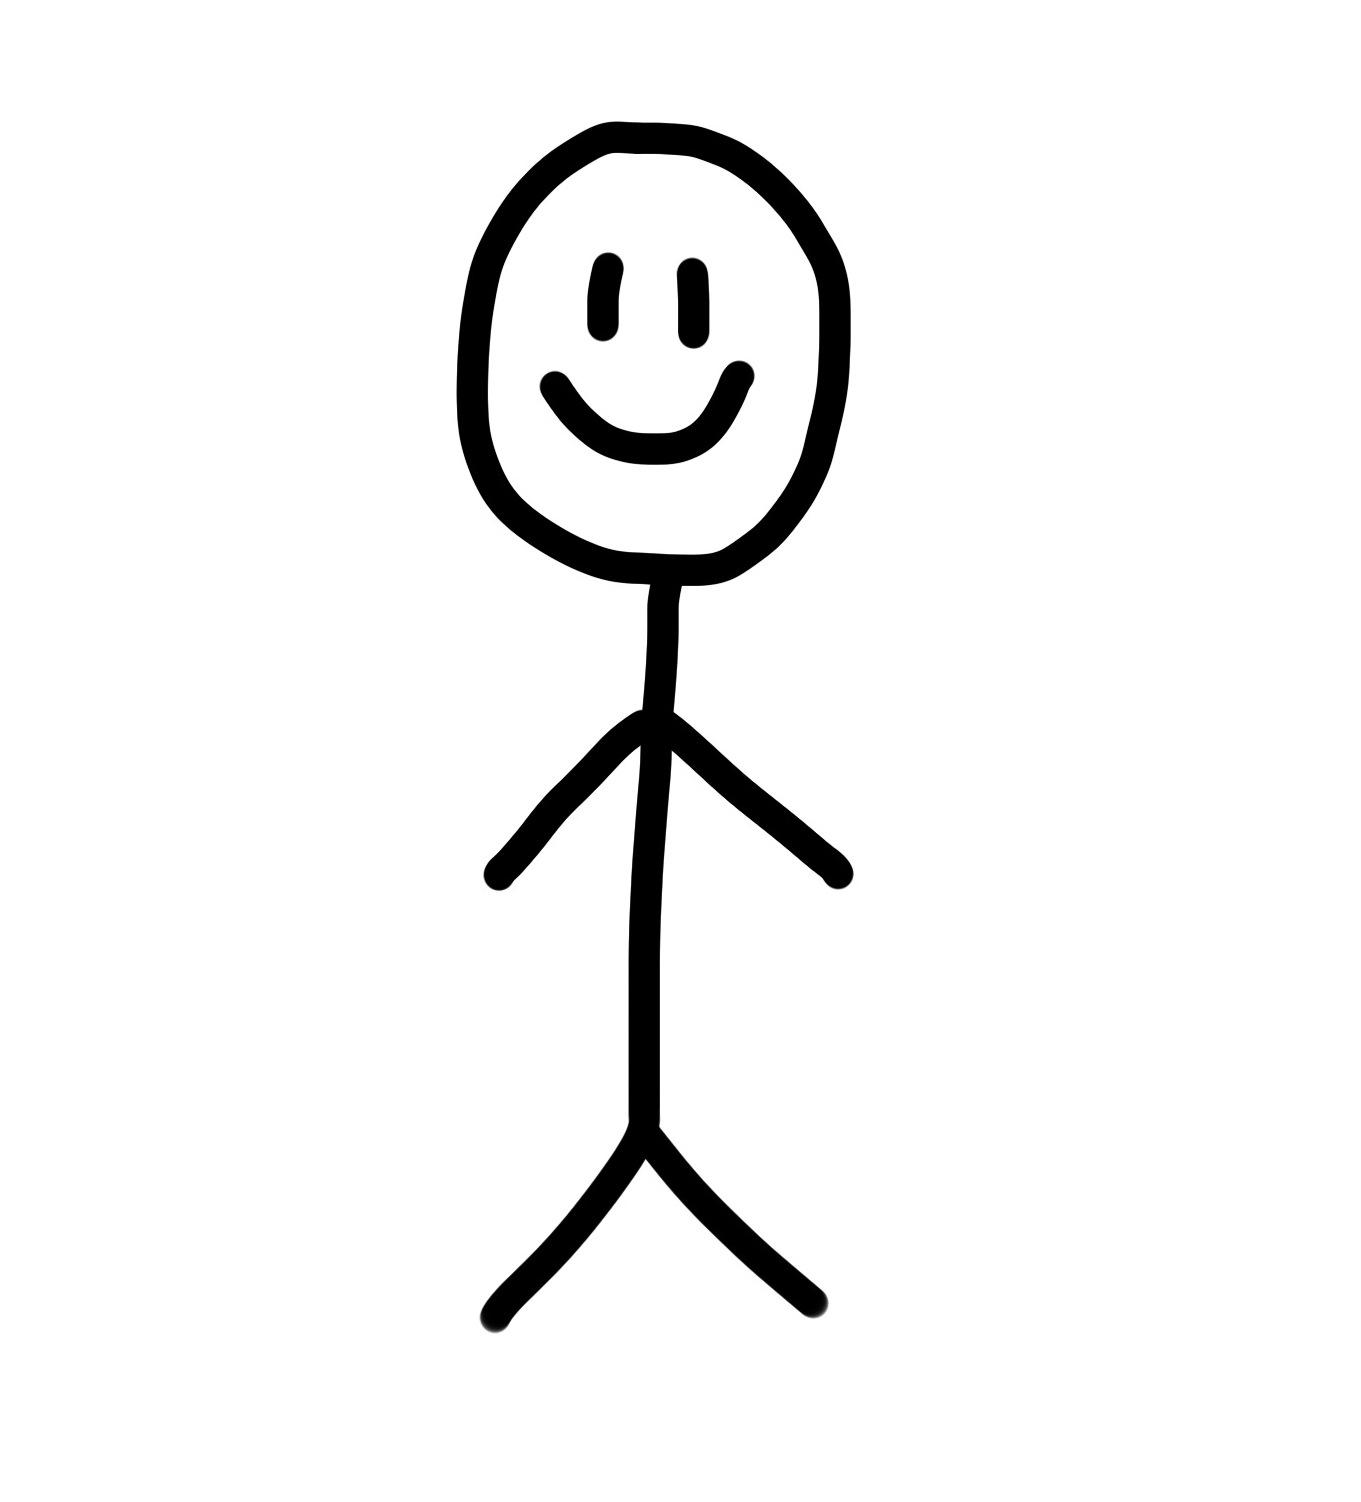 skv3y stick figure blank template imgflip